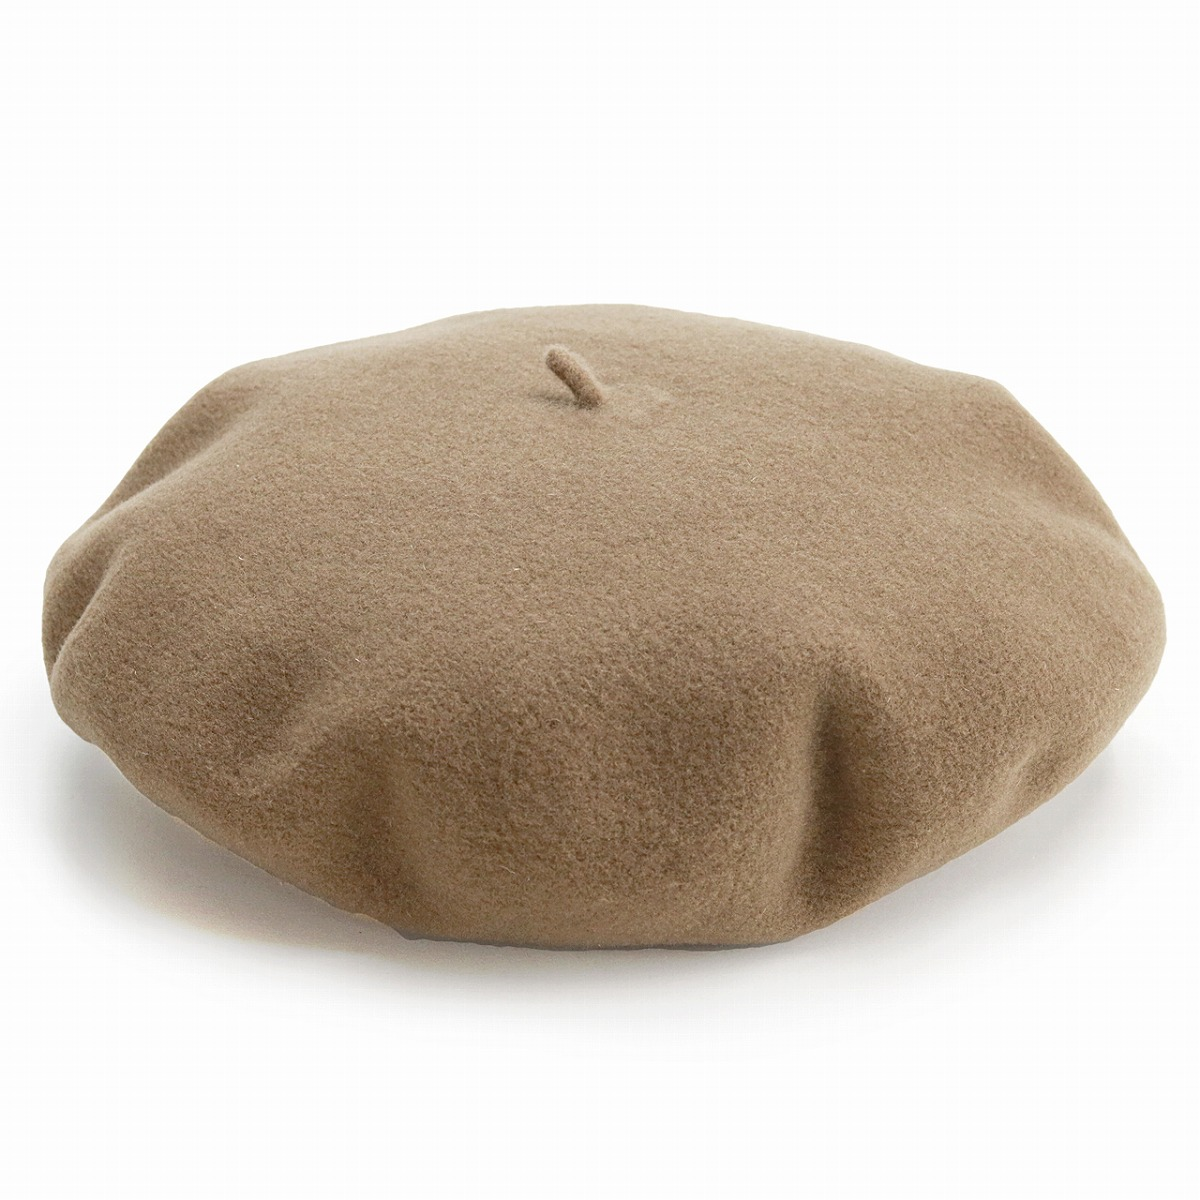 c6c642cad6de82 ELEHELM HAT STORE: LAULHERE beret Hat women's Laurel autumn/winter Basque  Vera ladies beret hat made in France brand import bag Laurel men's authentic  beret ...